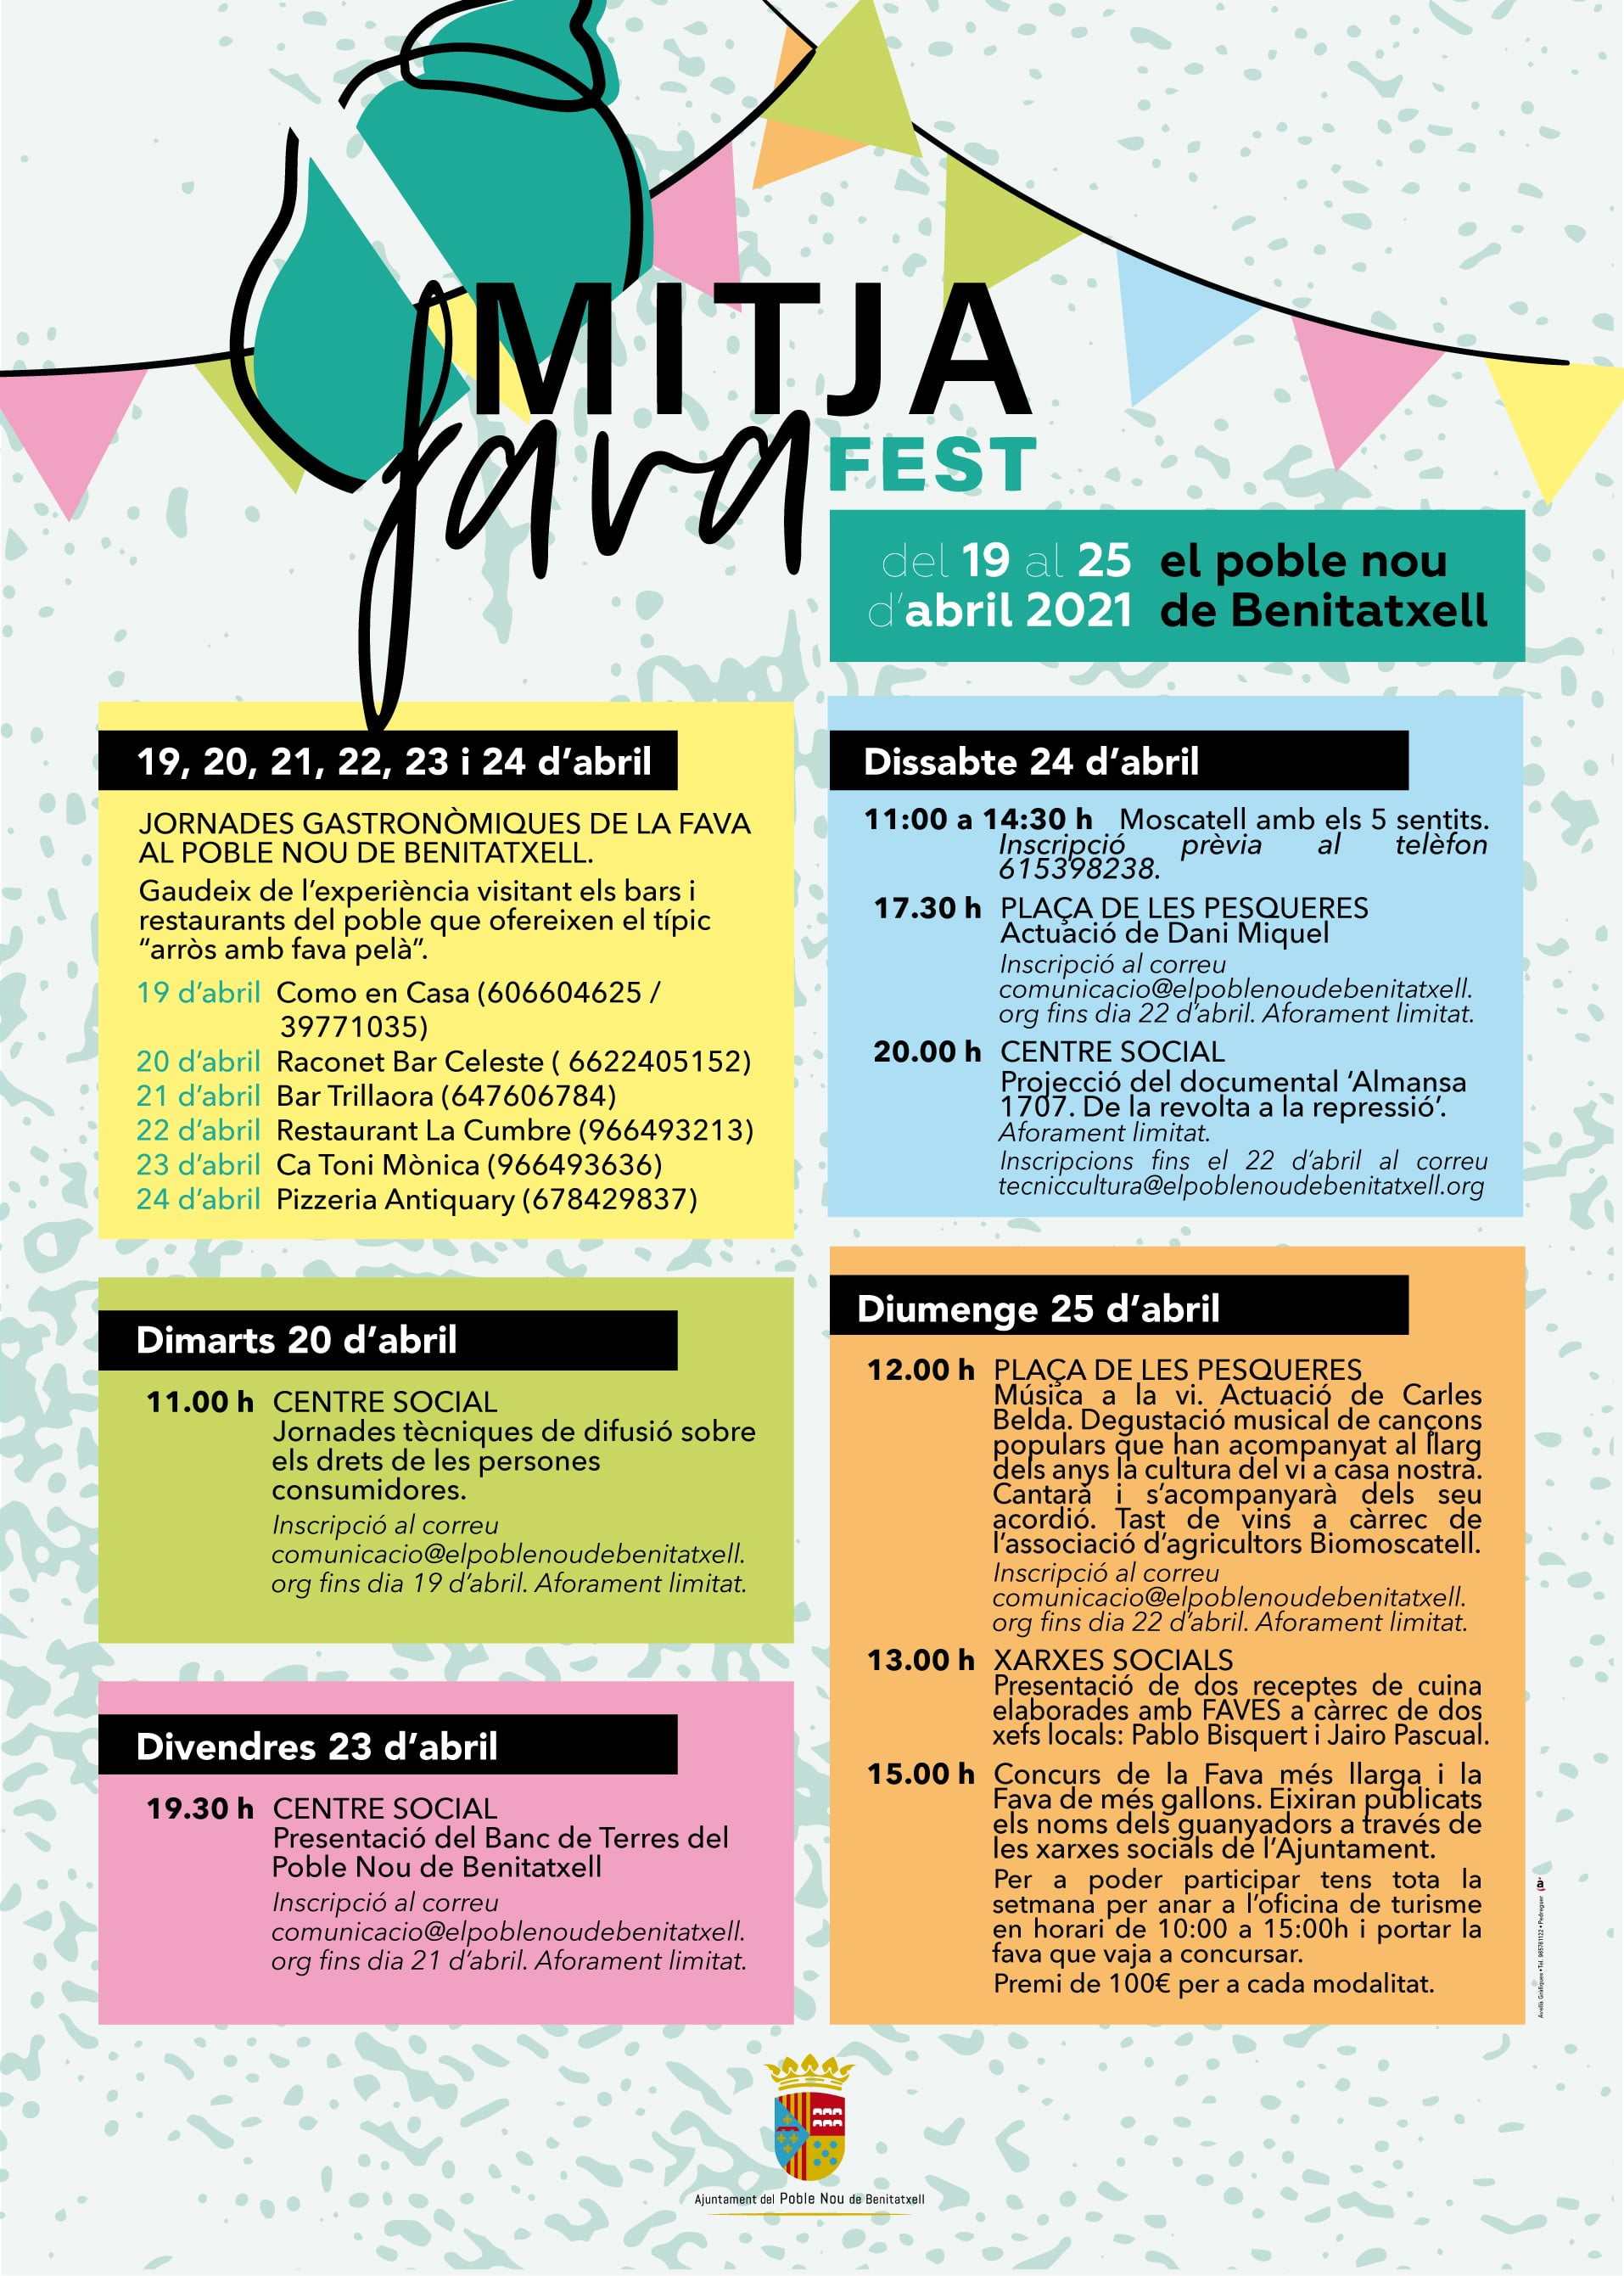 Cartel del Mitjafava Fest 2021